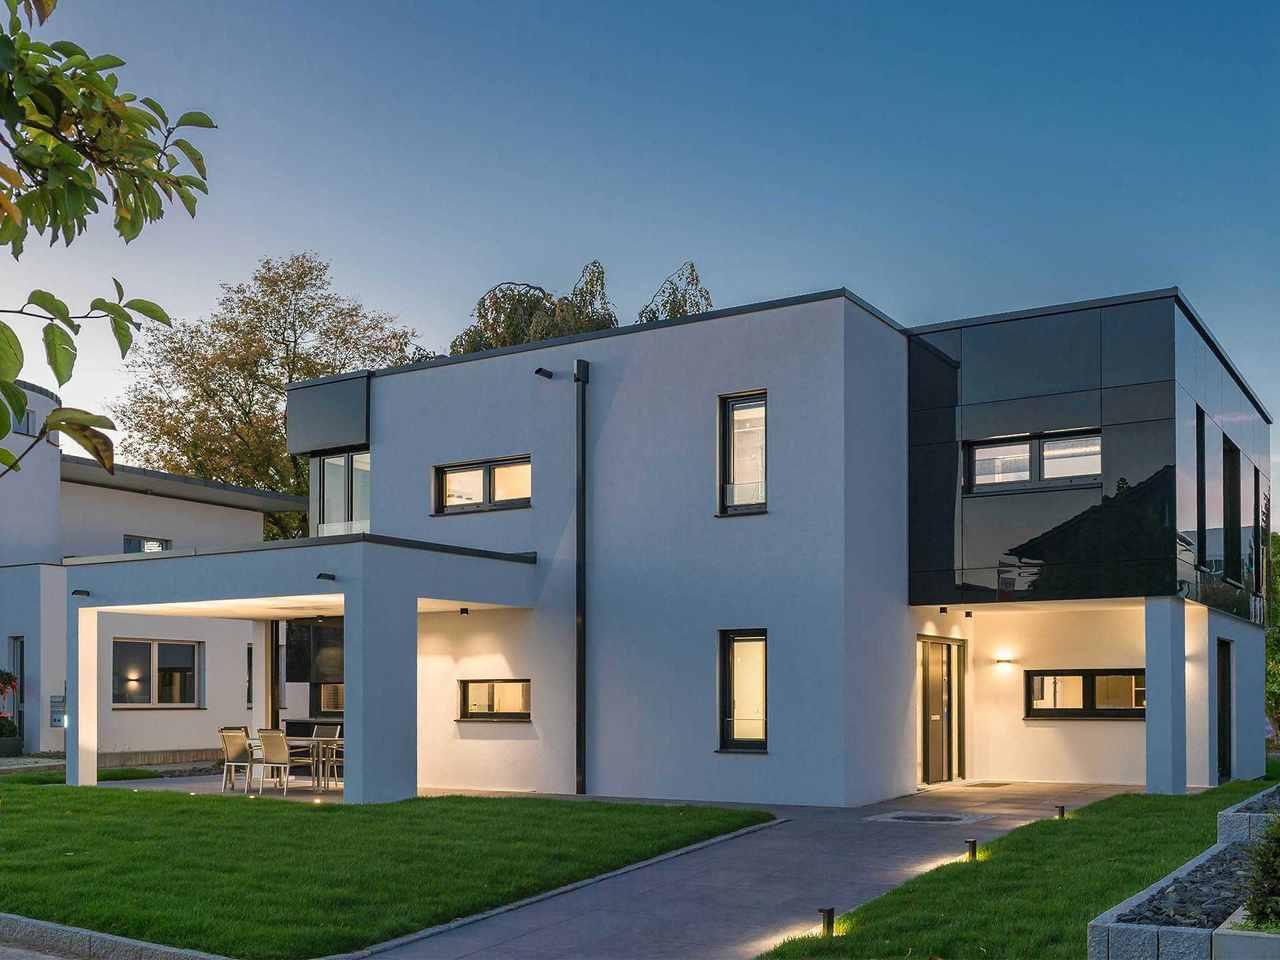 musterhaus san diego rensch haus. Black Bedroom Furniture Sets. Home Design Ideas